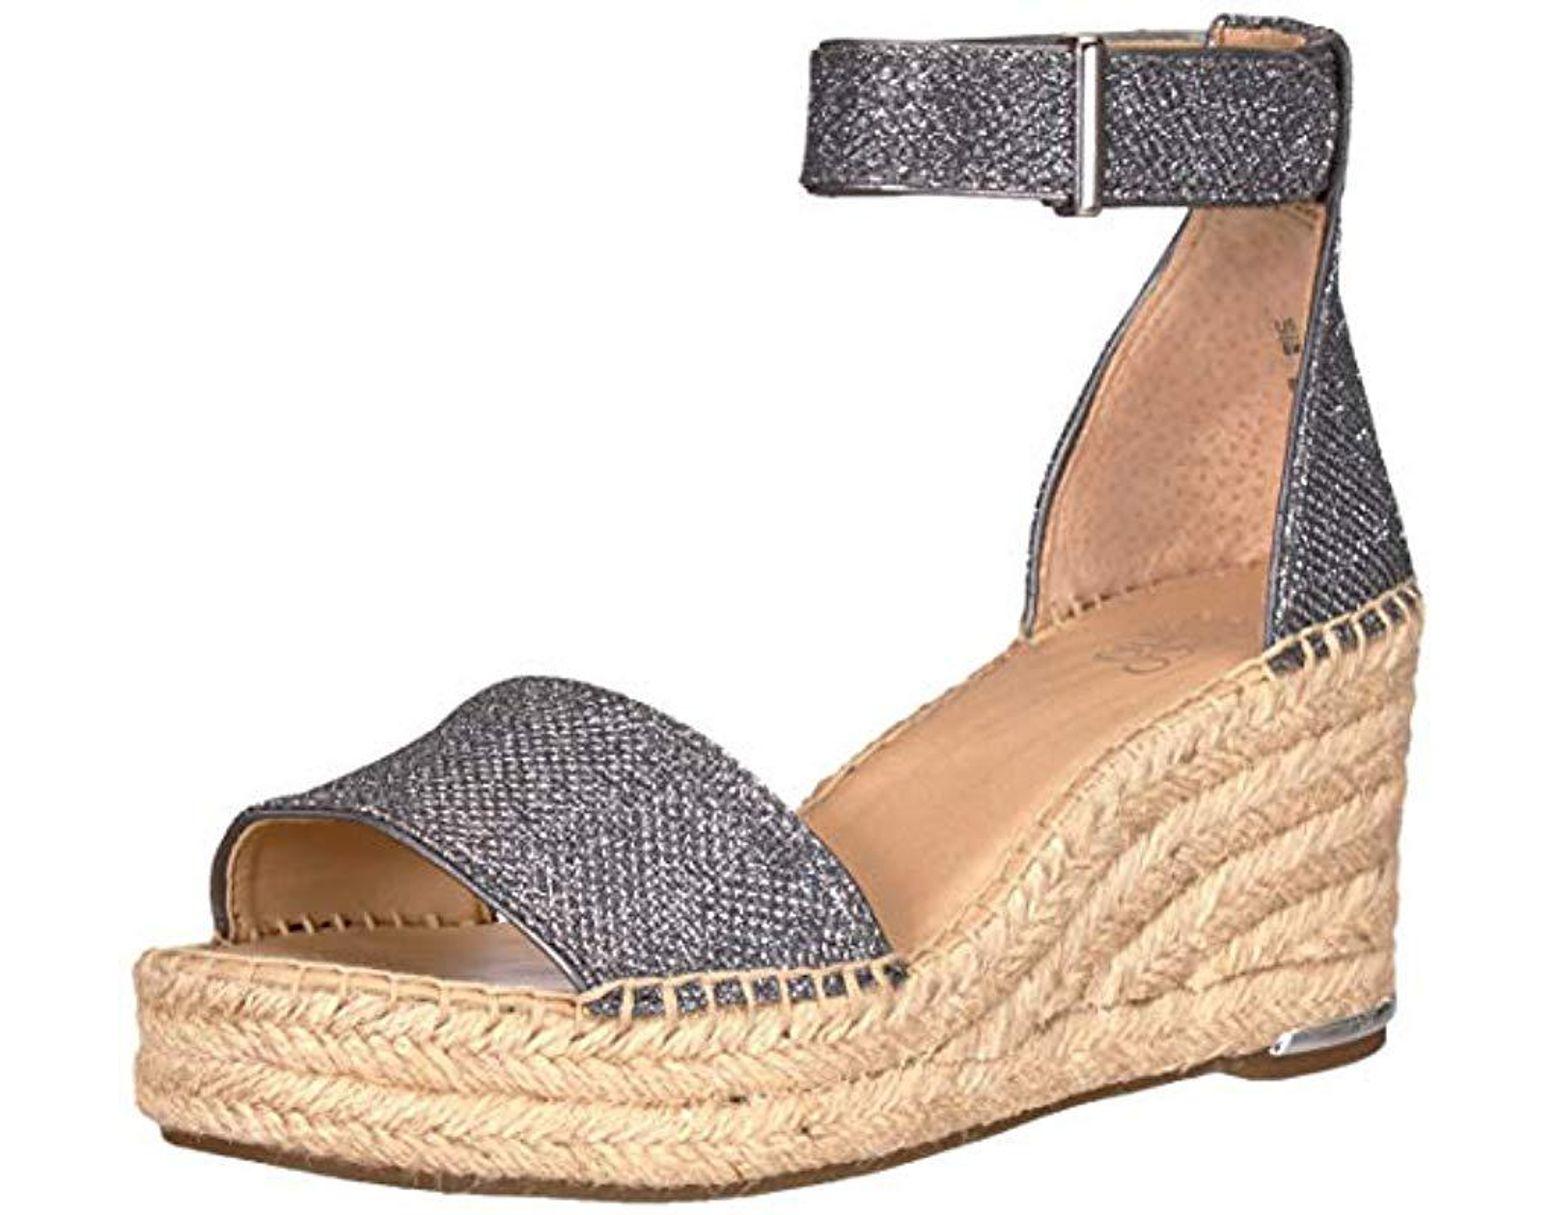 e5db33fb25d Women's Metallic Clemens Espadrille Wedge Sandal